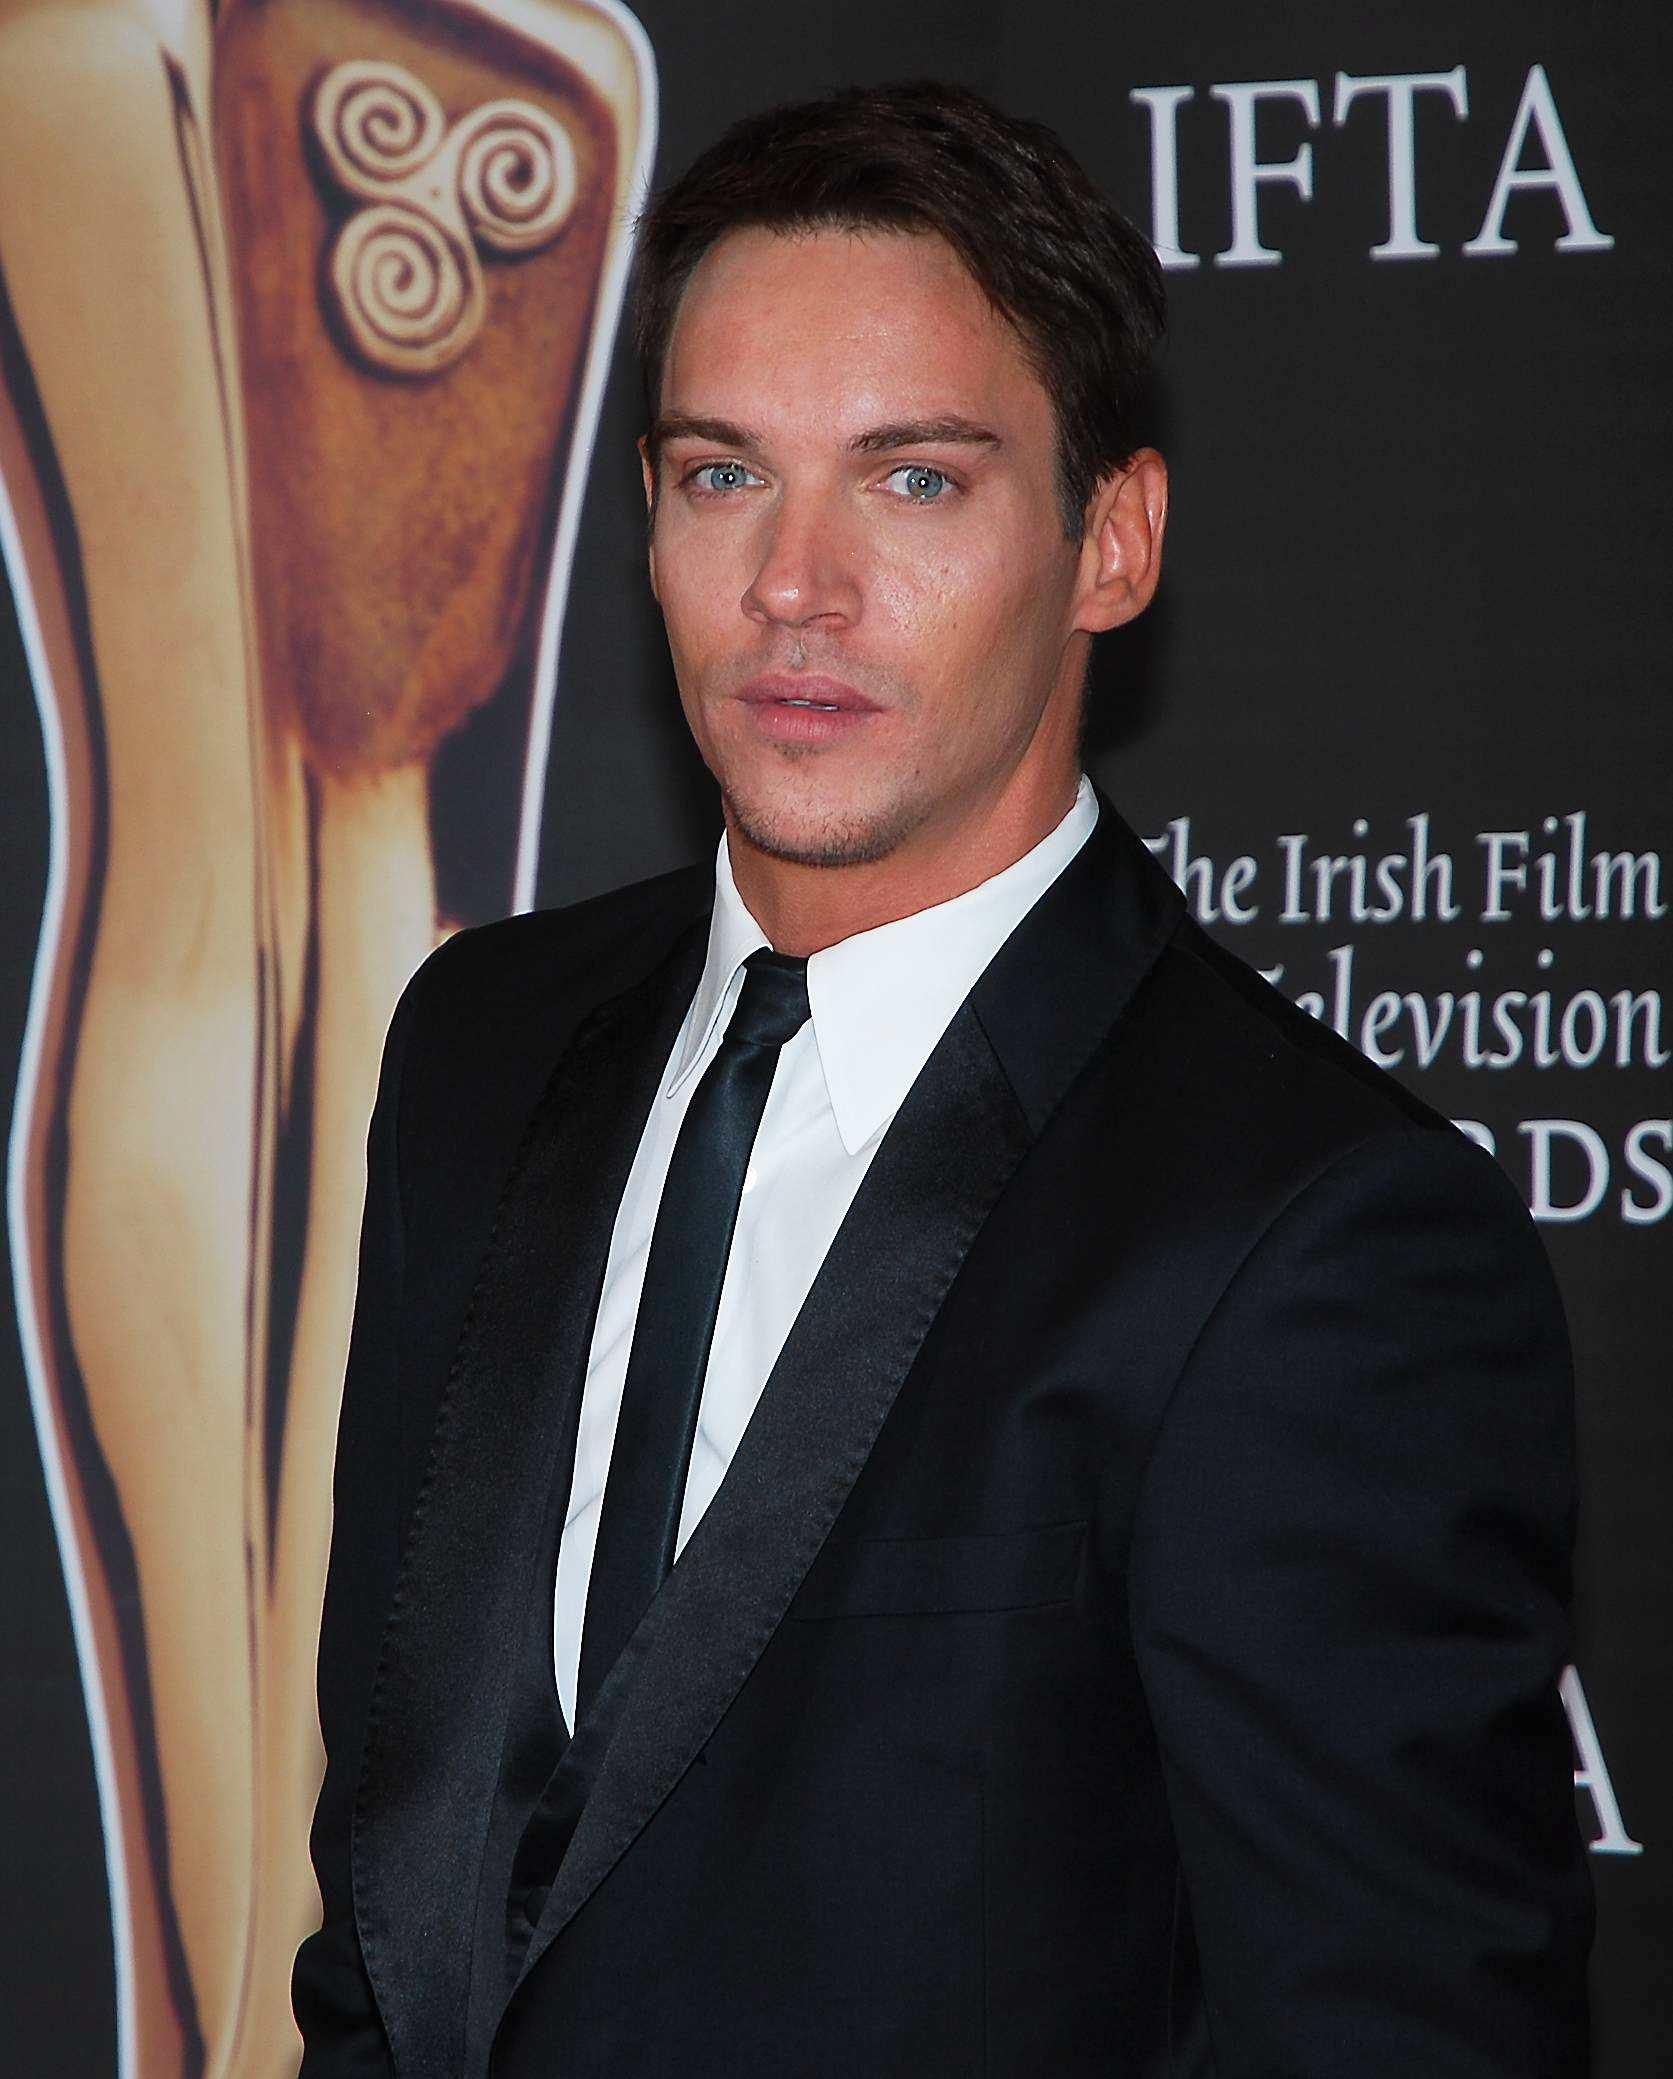 7th Annual Irish Film & Television Awards